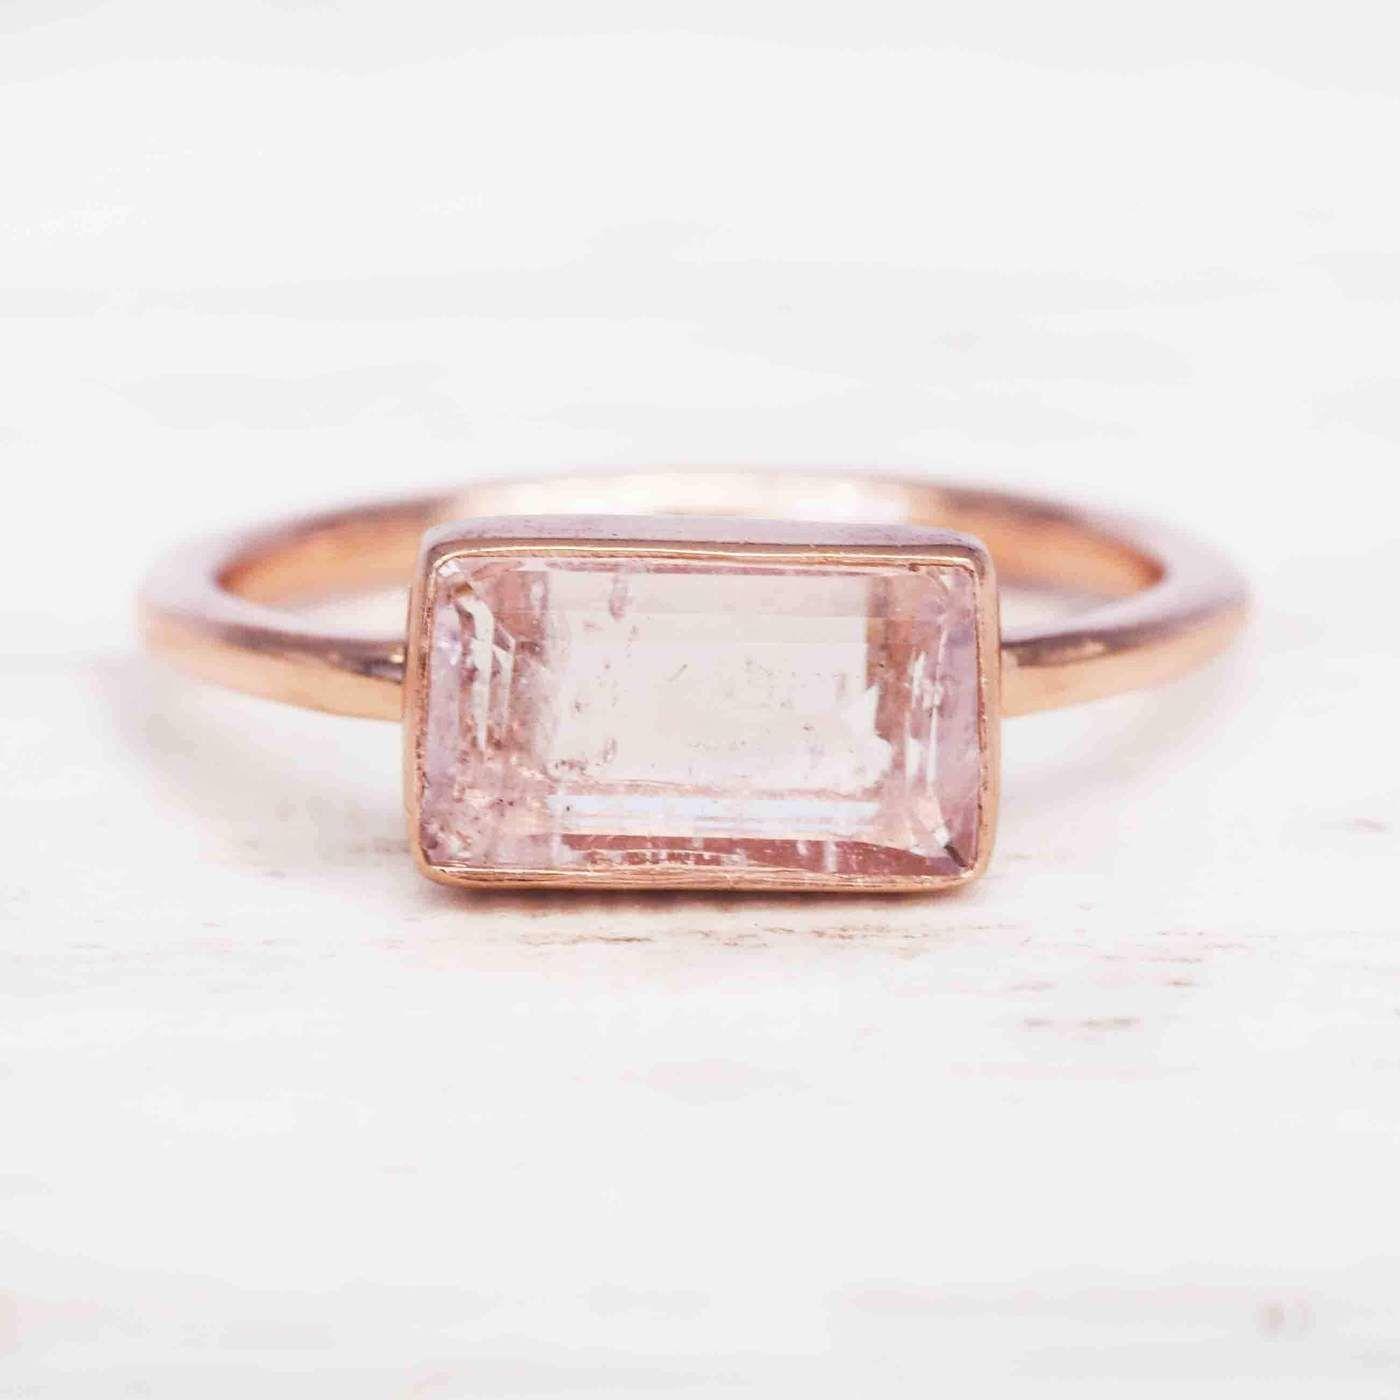 Rose Gold Amore Morganite Ring. Bohemian Jewellery. Indie and Harper. – www.indieandharper.com